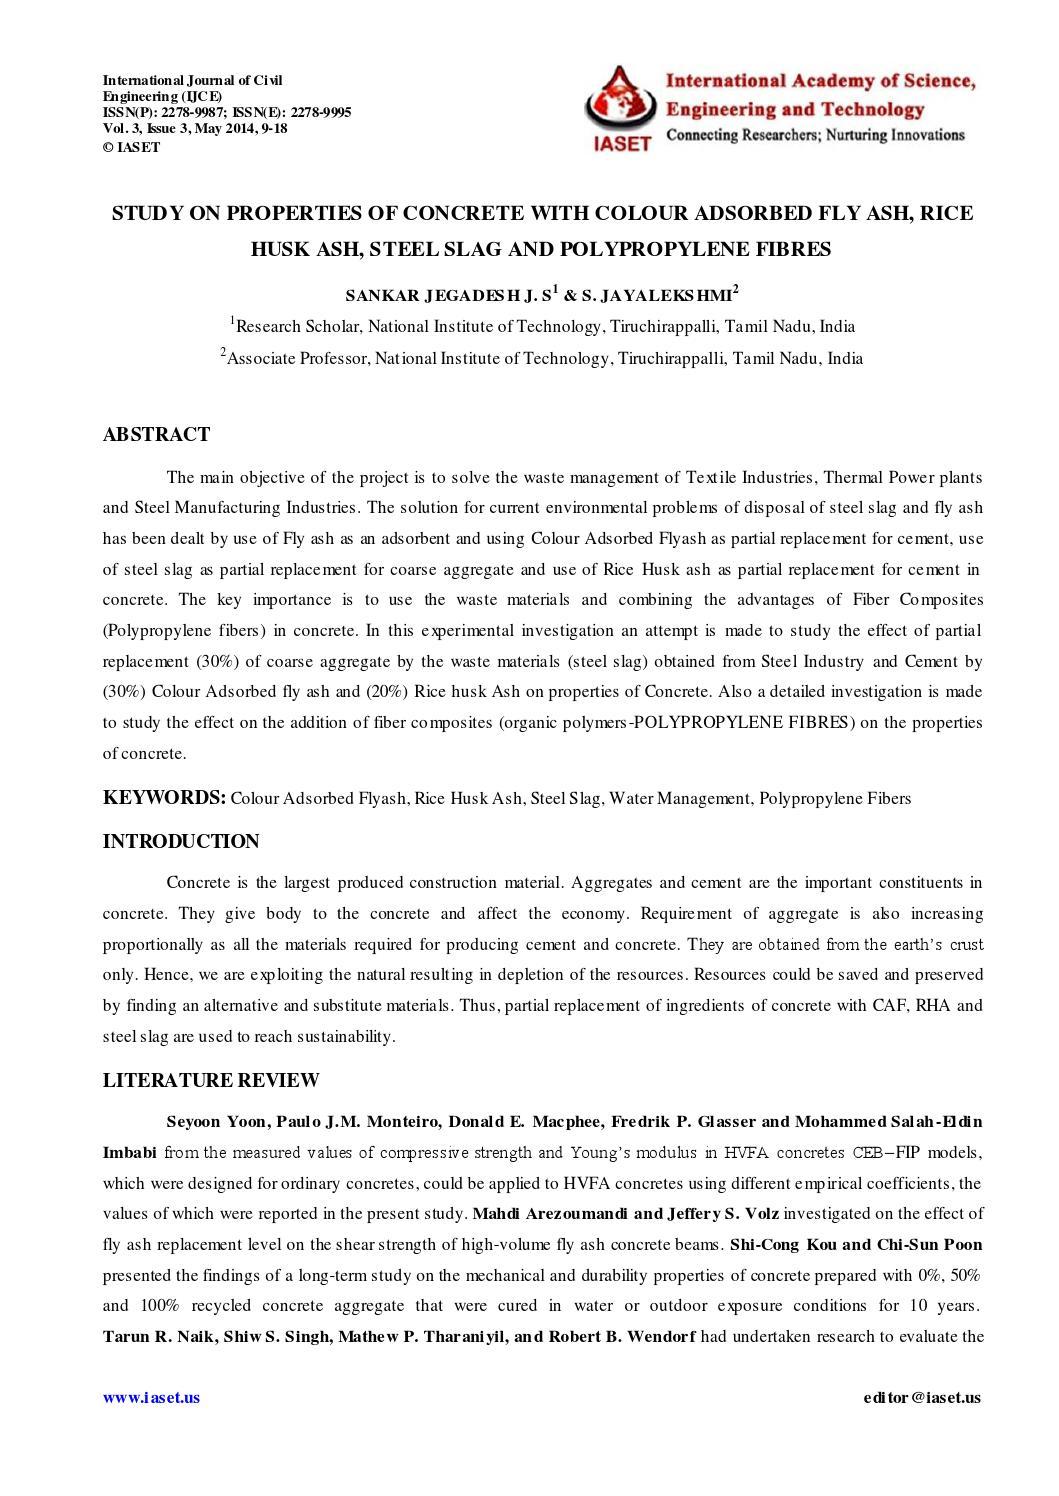 2 civil ijce study on properties of sankar jegadesh by IASET